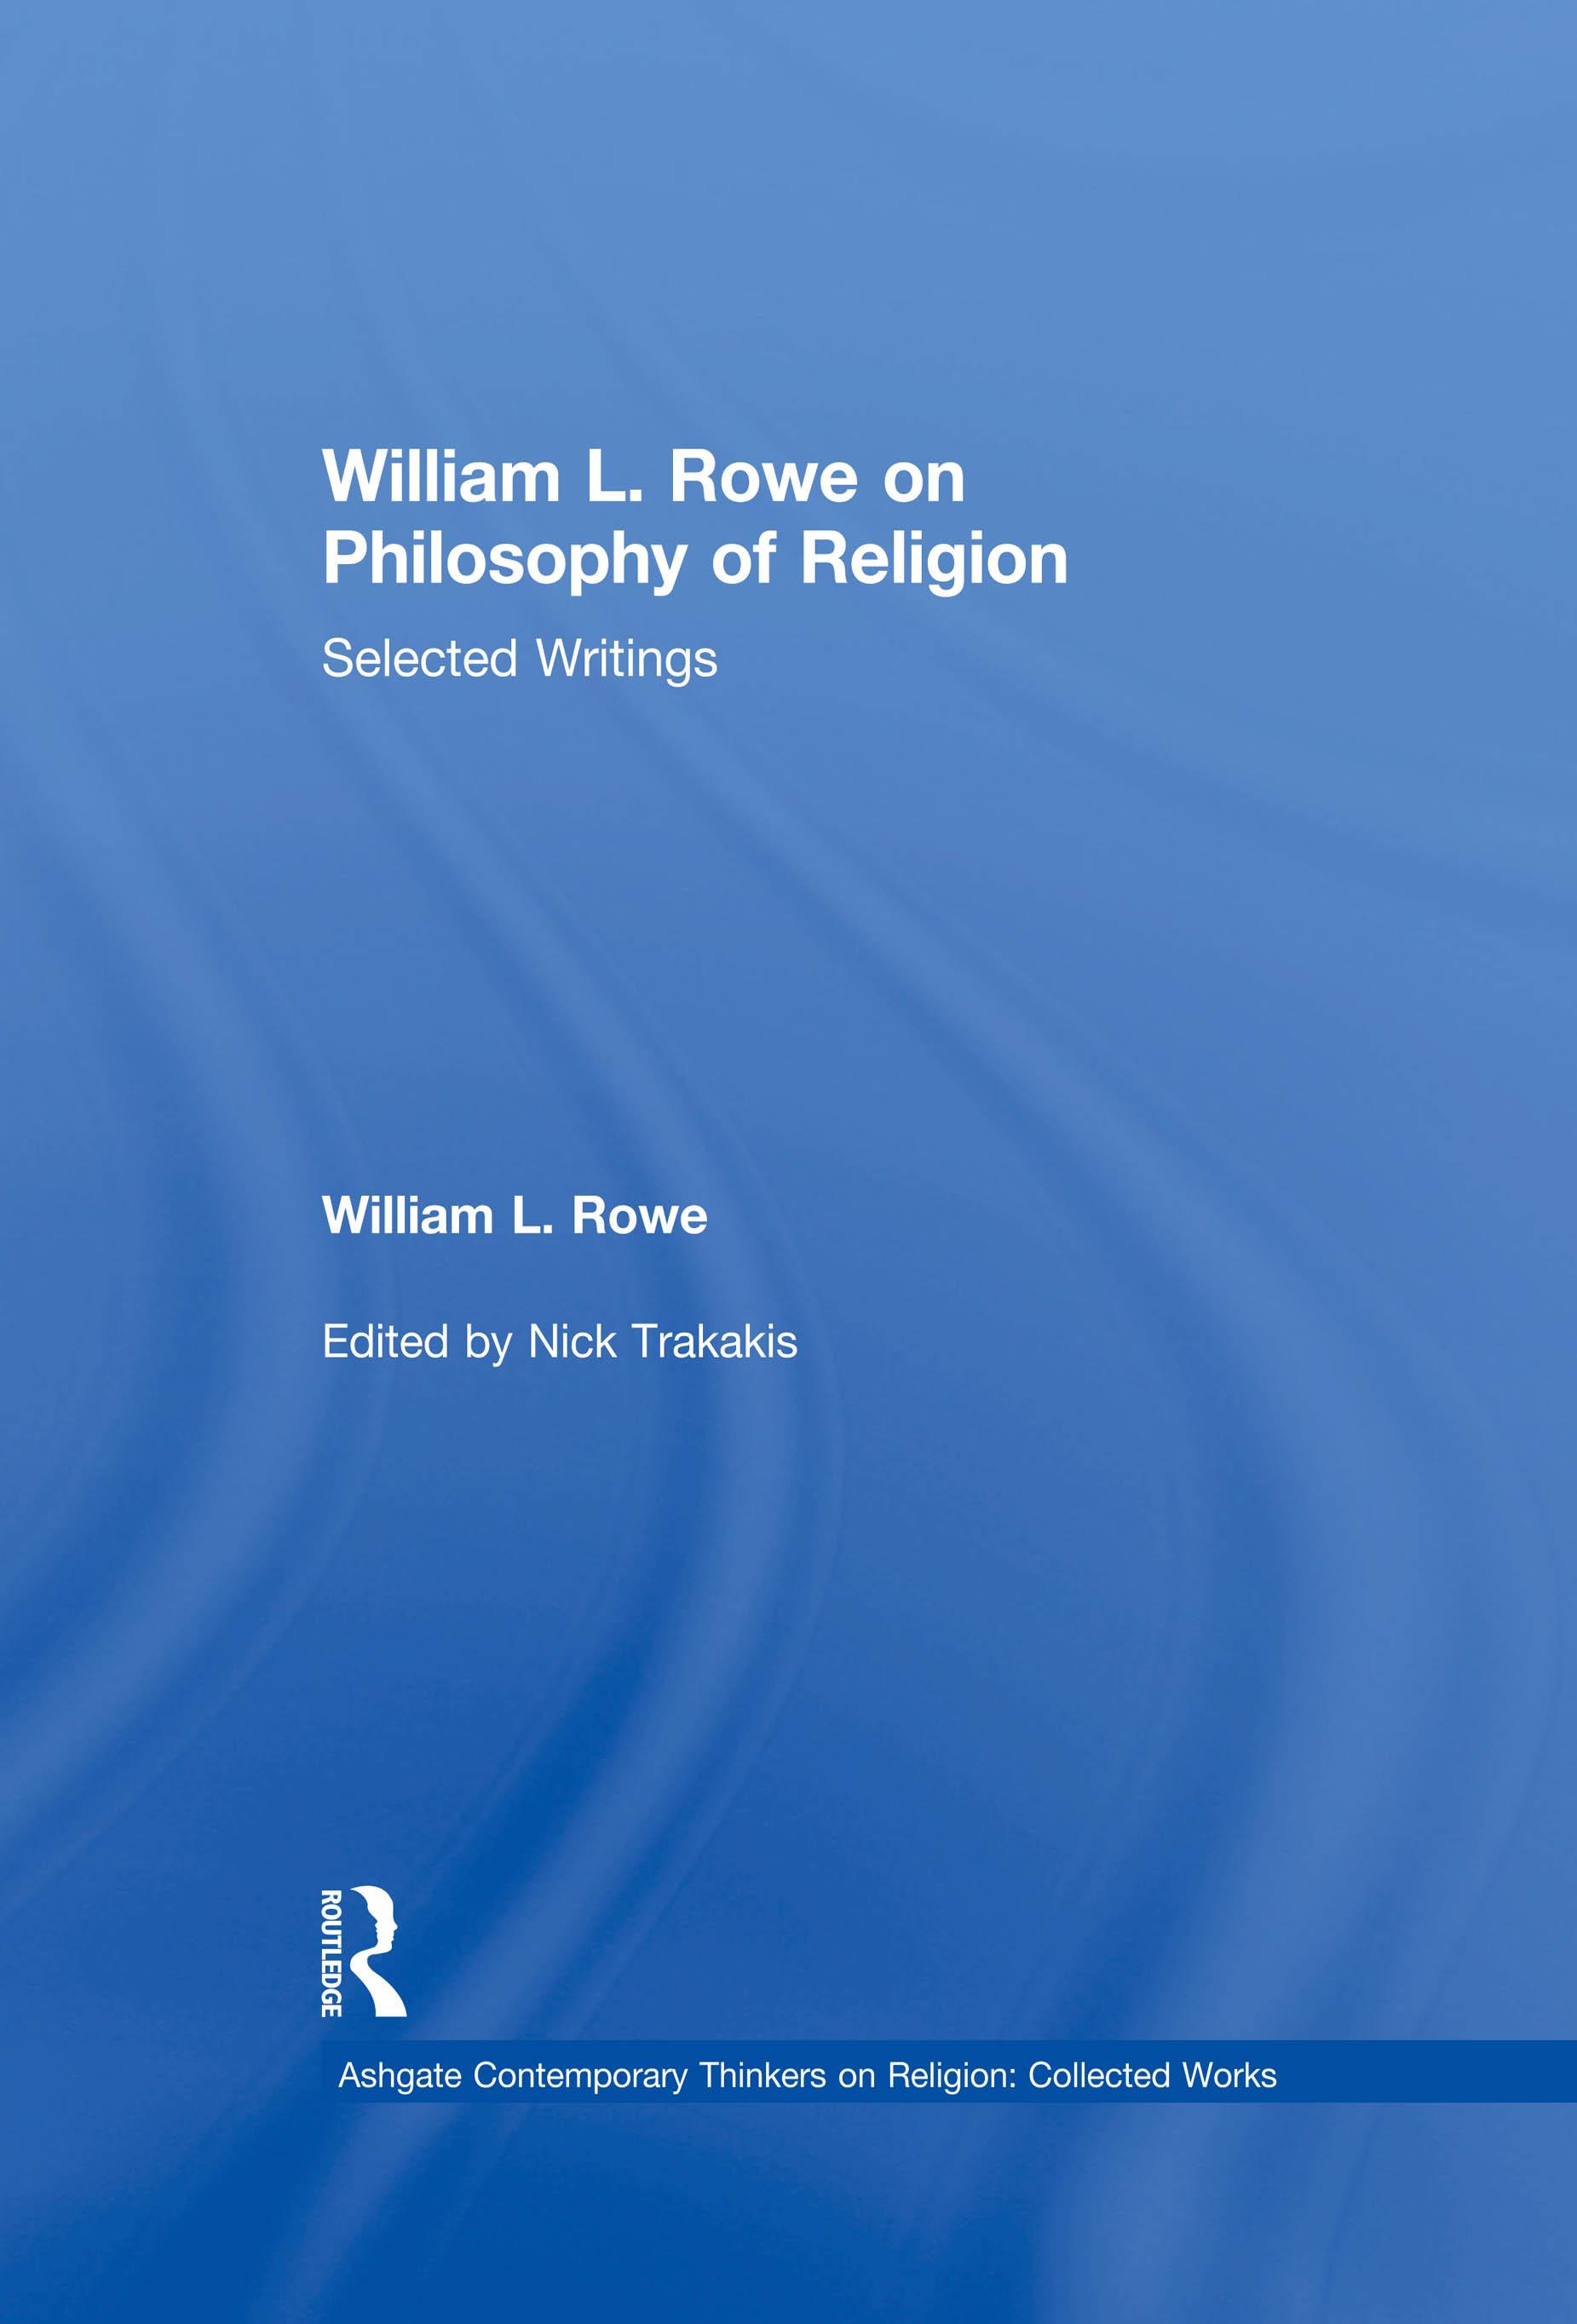 William L. Rowe on Philosophy of Religion